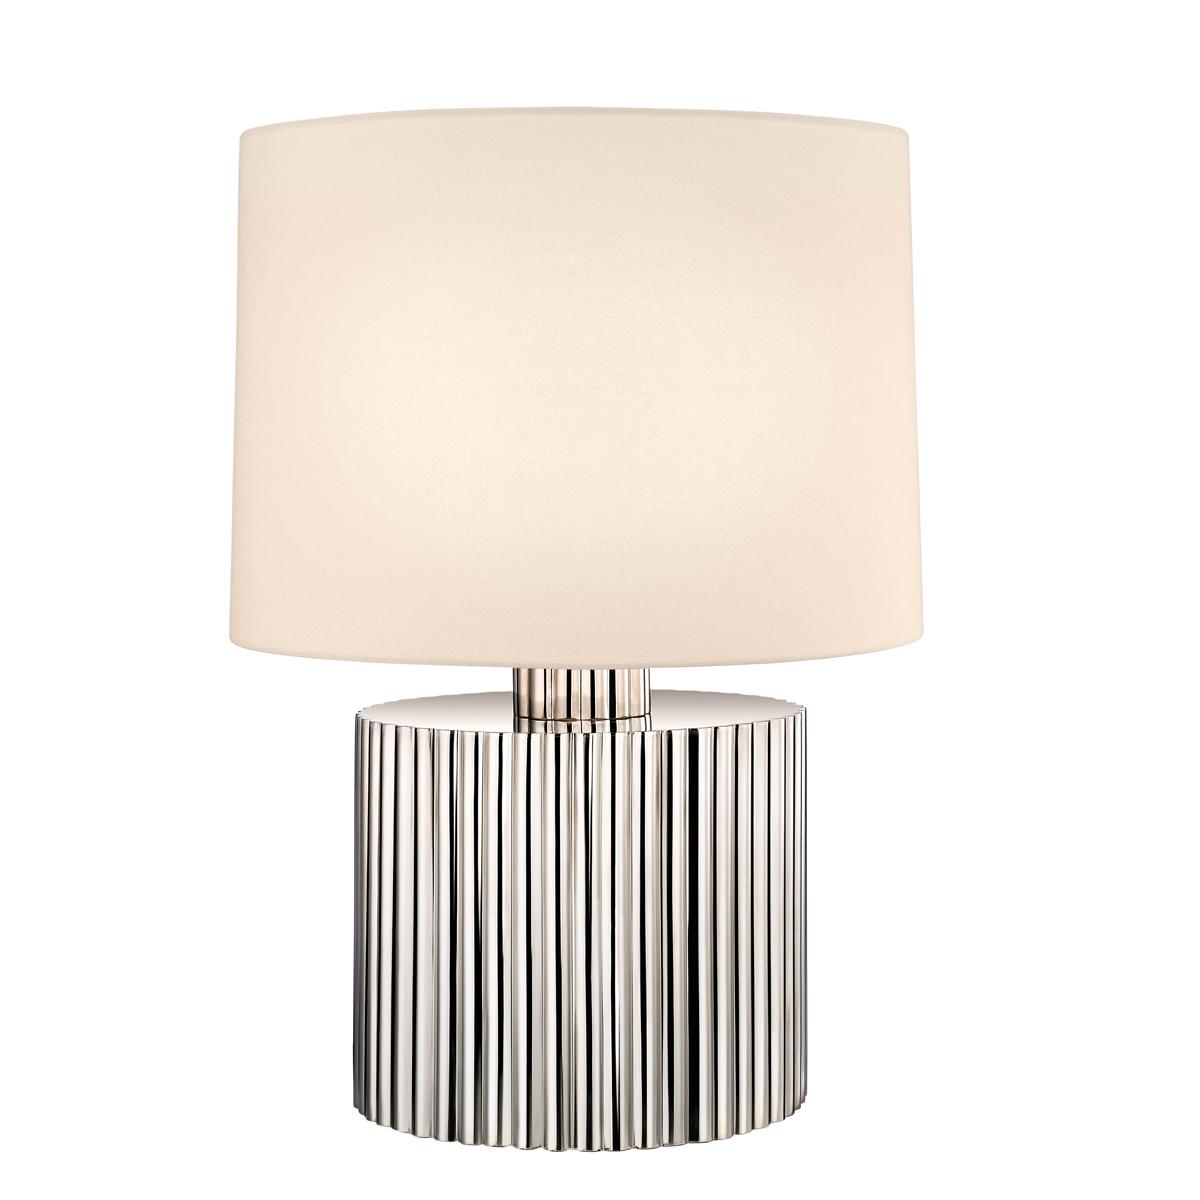 Sonneman paramount 463235 1 light low table lamp in polished nickel sonneman paramount 463235 1 light low table lamp in polished nickel mozeypictures Gallery